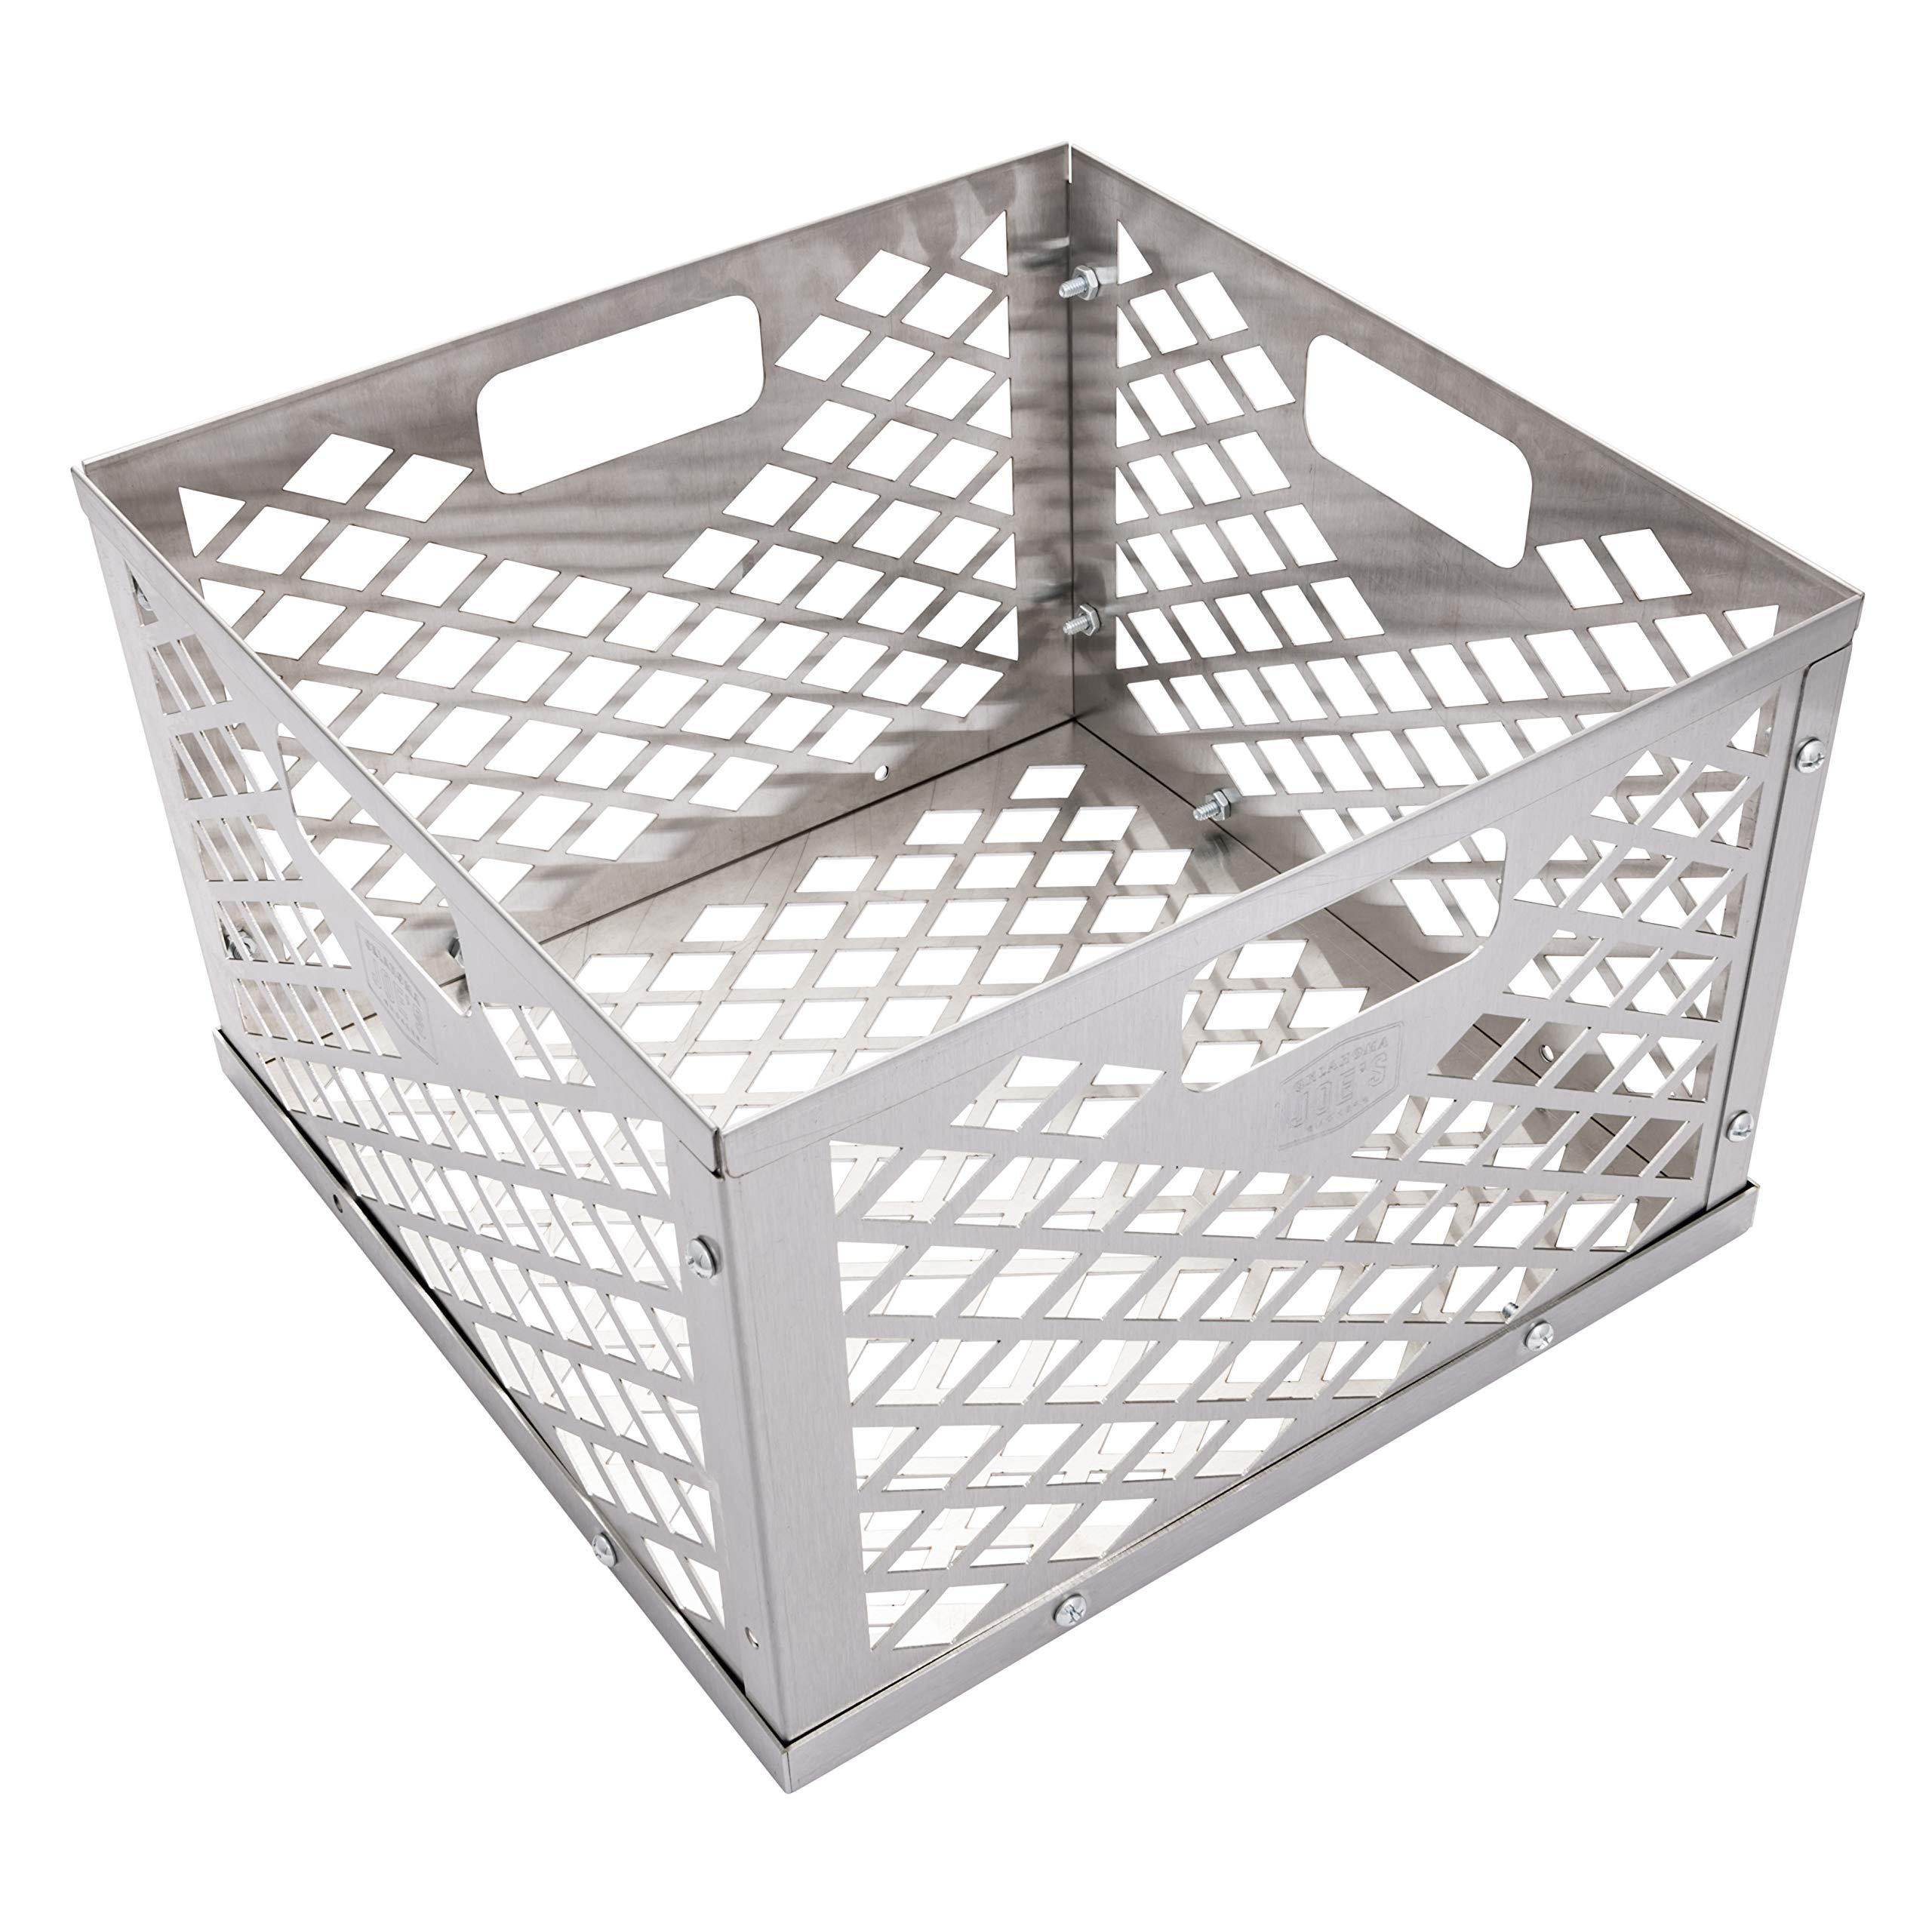 Oklahoma Joe's 5279338P04 Firebox Basket, Silver by Oklahoma Joe's (Image #1)